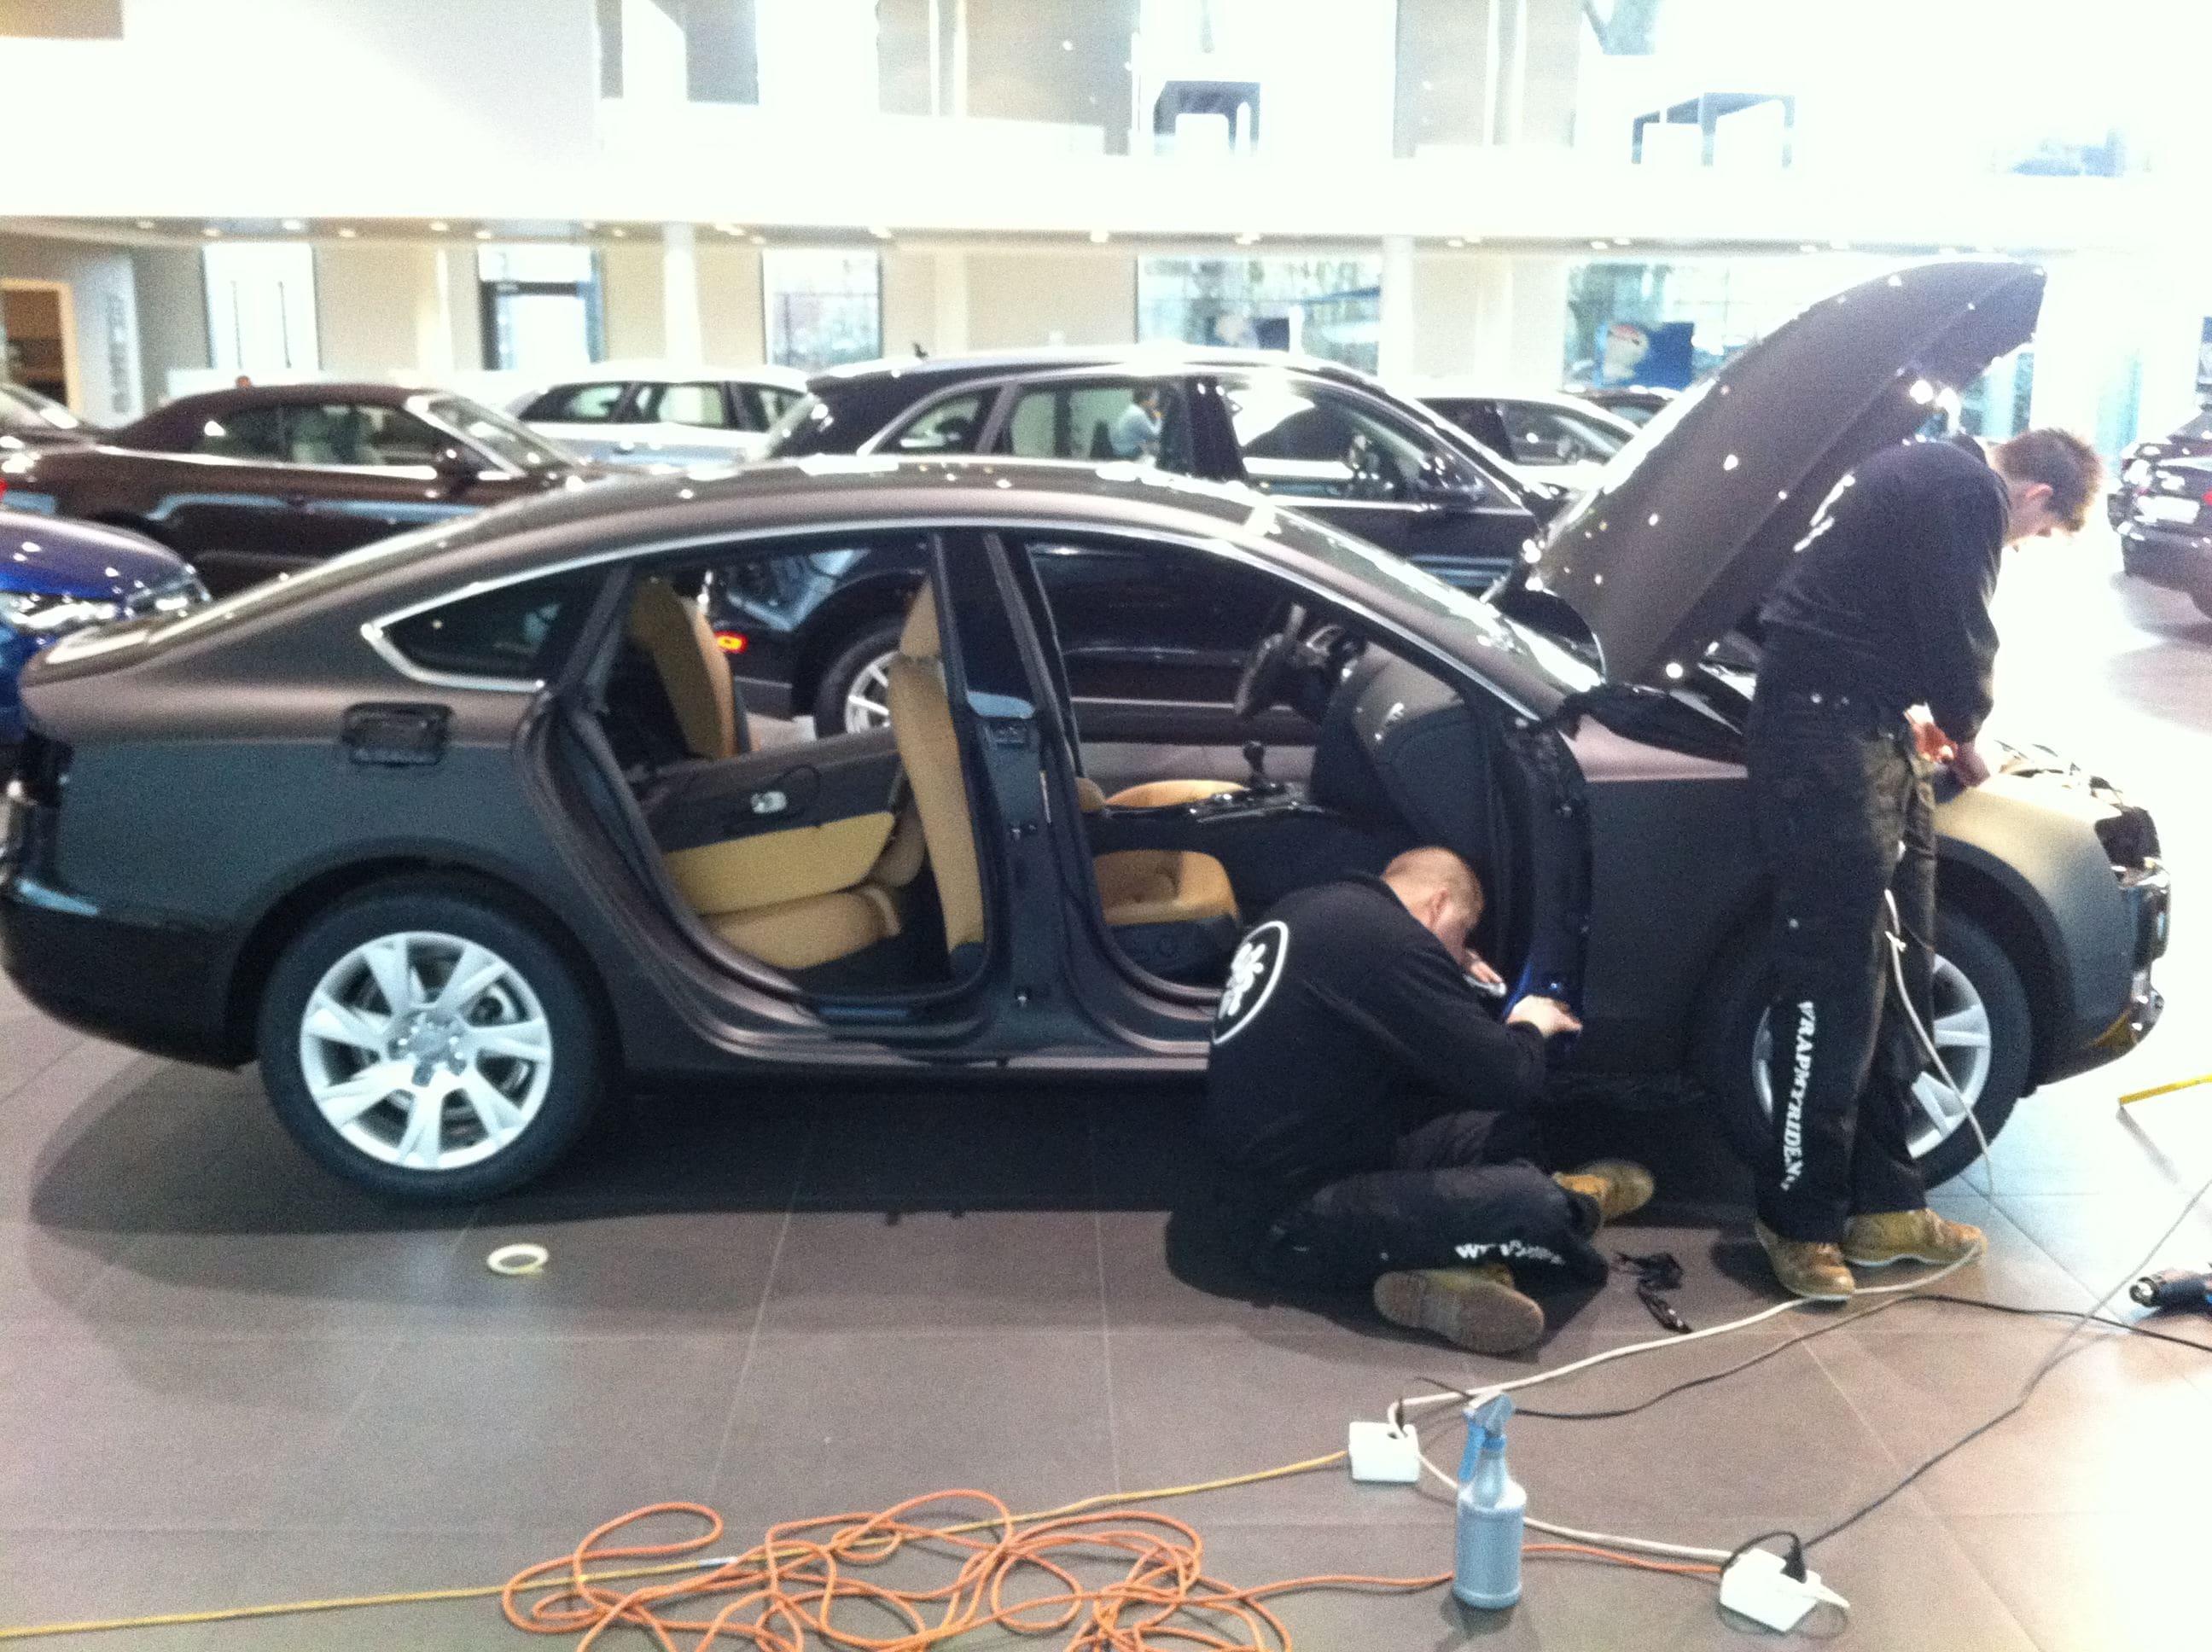 Audi A5 Sportback met Mat Grijze Wrap, Carwrapping door Wrapmyride.nu Foto-nr:4763, ©2021